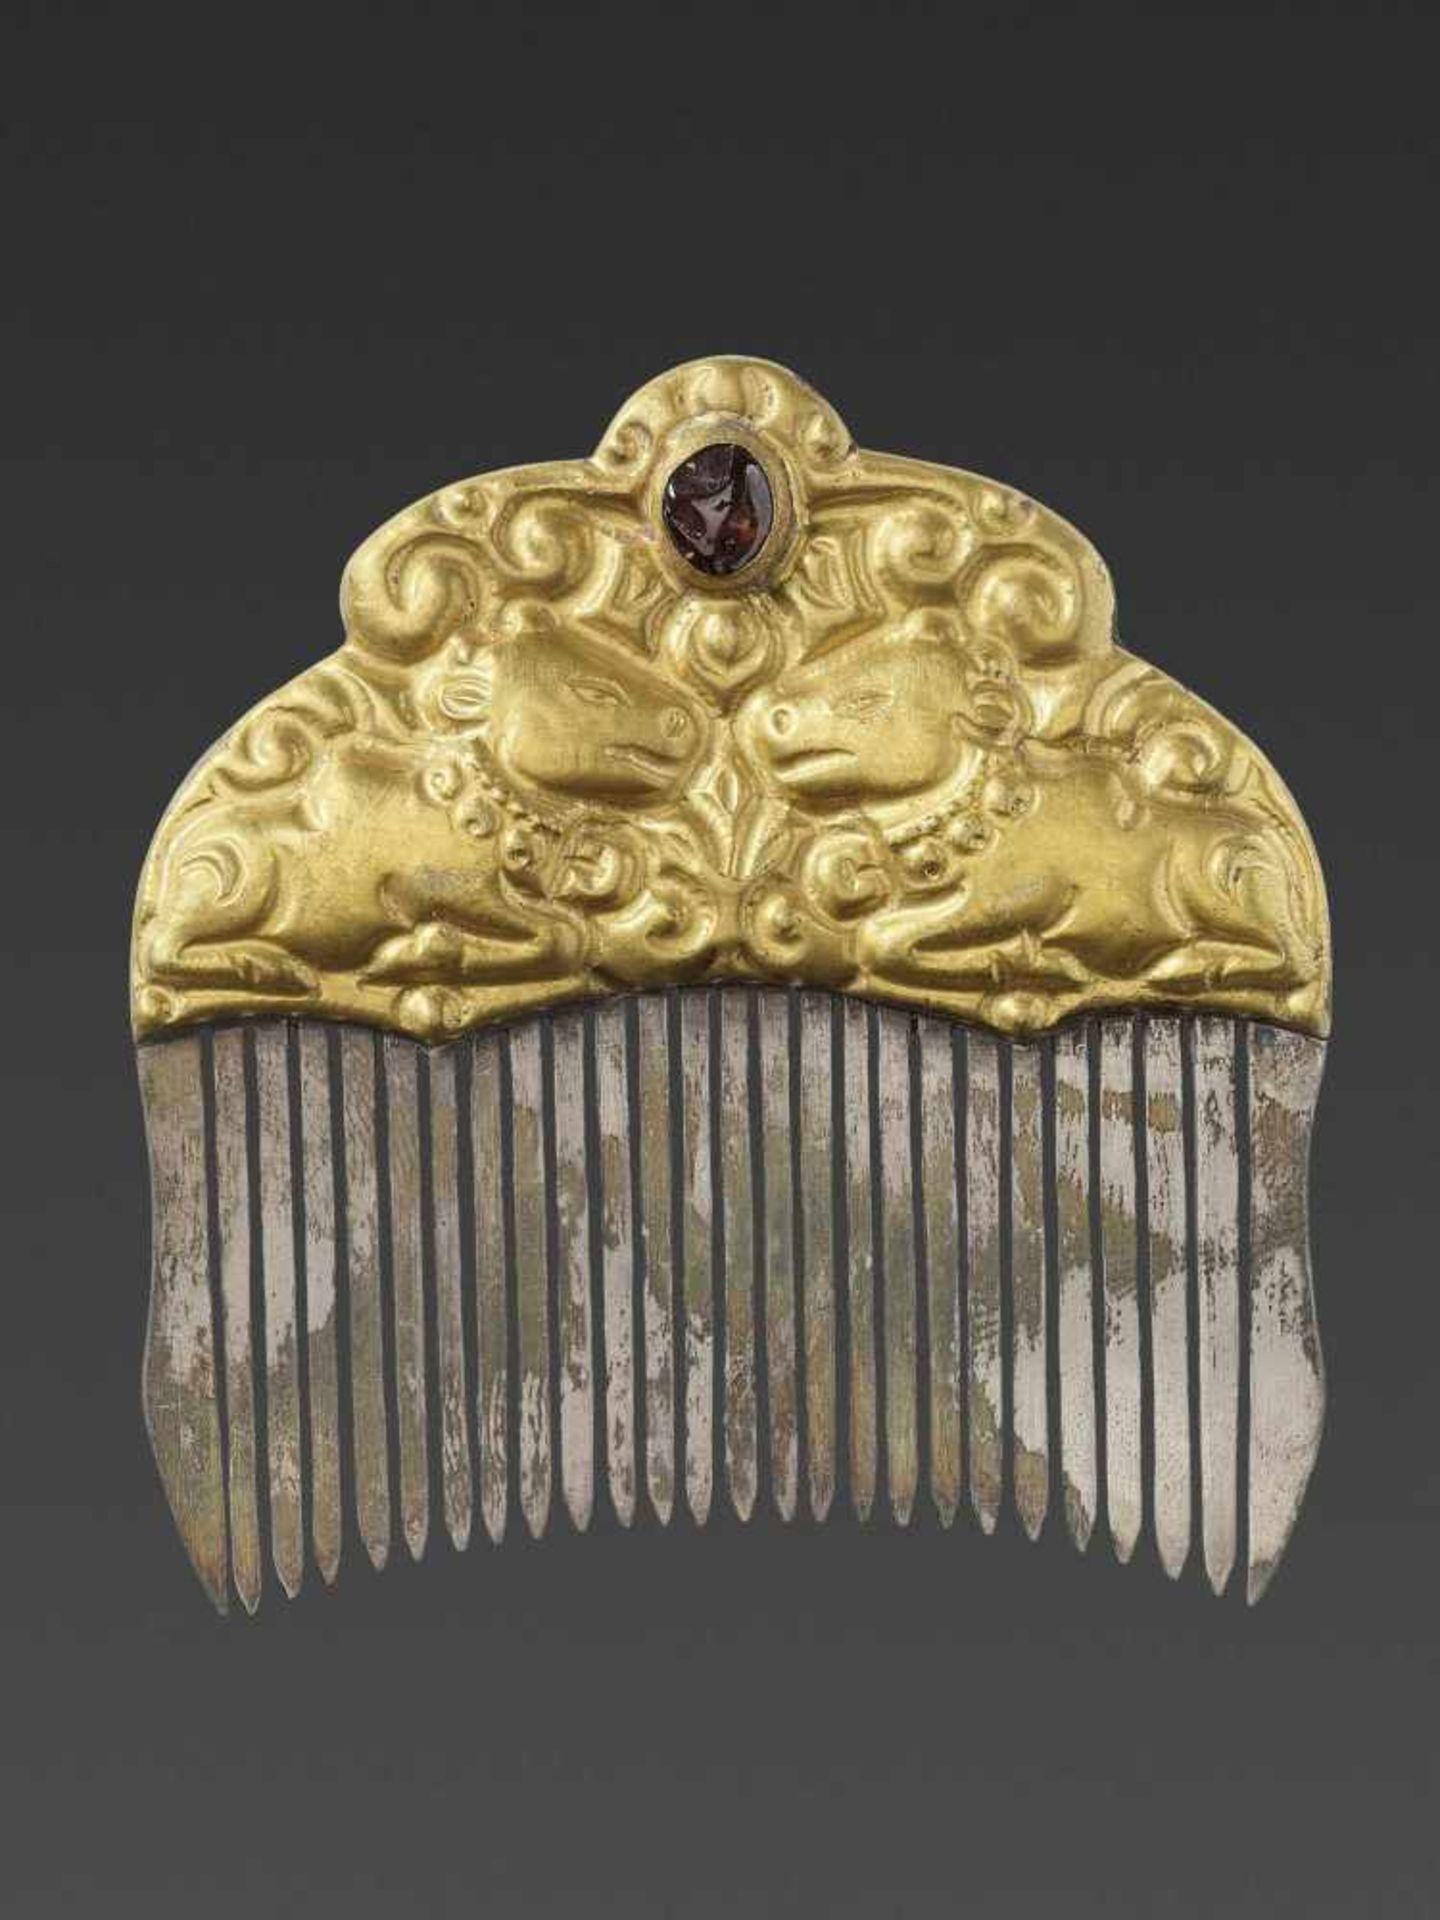 A CHAM GEMSTONE-SET GOLD REPOUSSÉ AND SILVER HAIR COMB WITH NANDI BULLS - Bild 2 aus 5